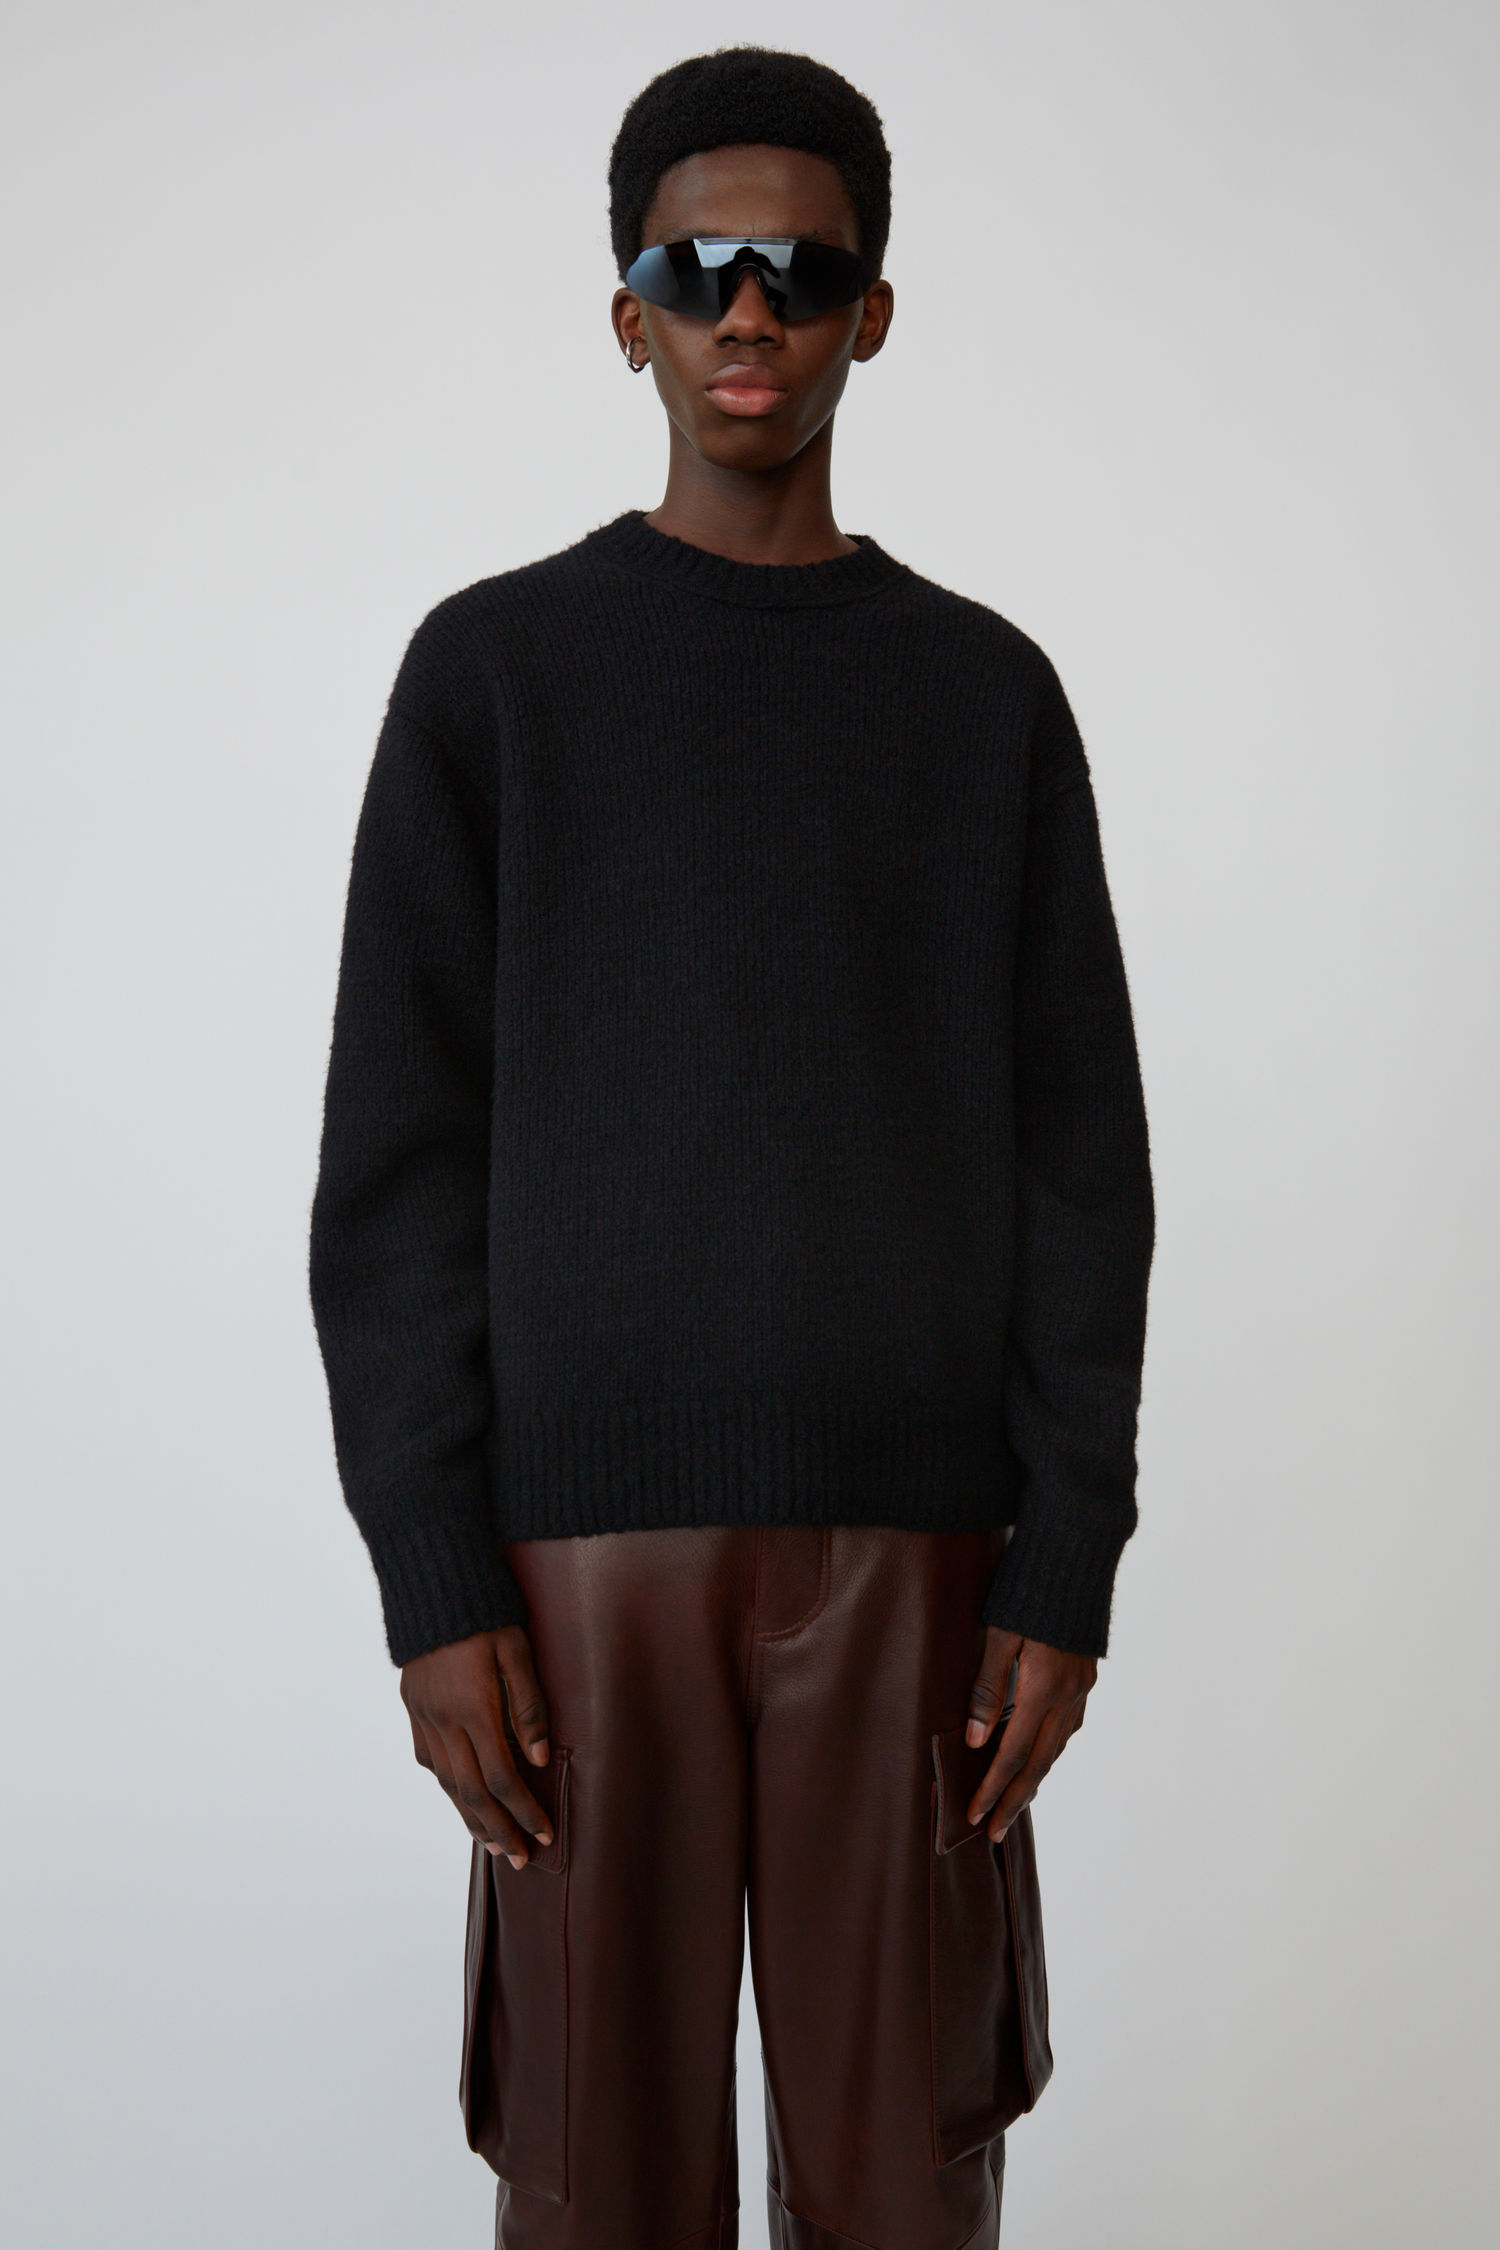 acne_studios_Relaxed_crewneck_sweater_all_black_1.jpg